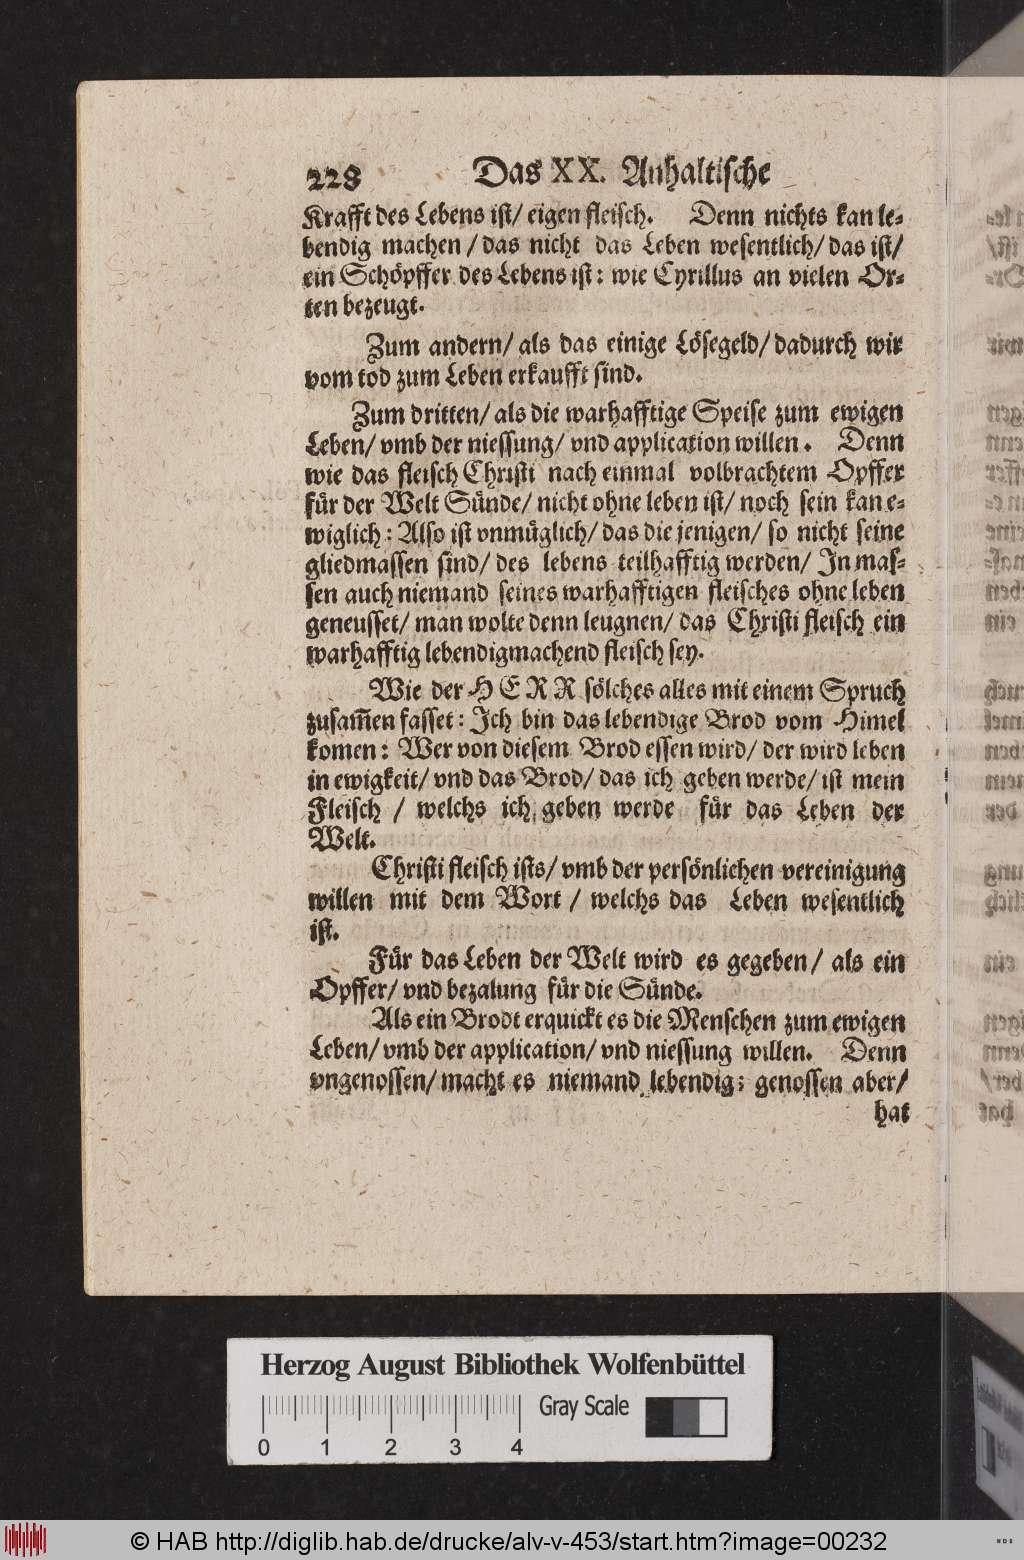 http://diglib.hab.de/drucke/alv-v-453/00232.jpg